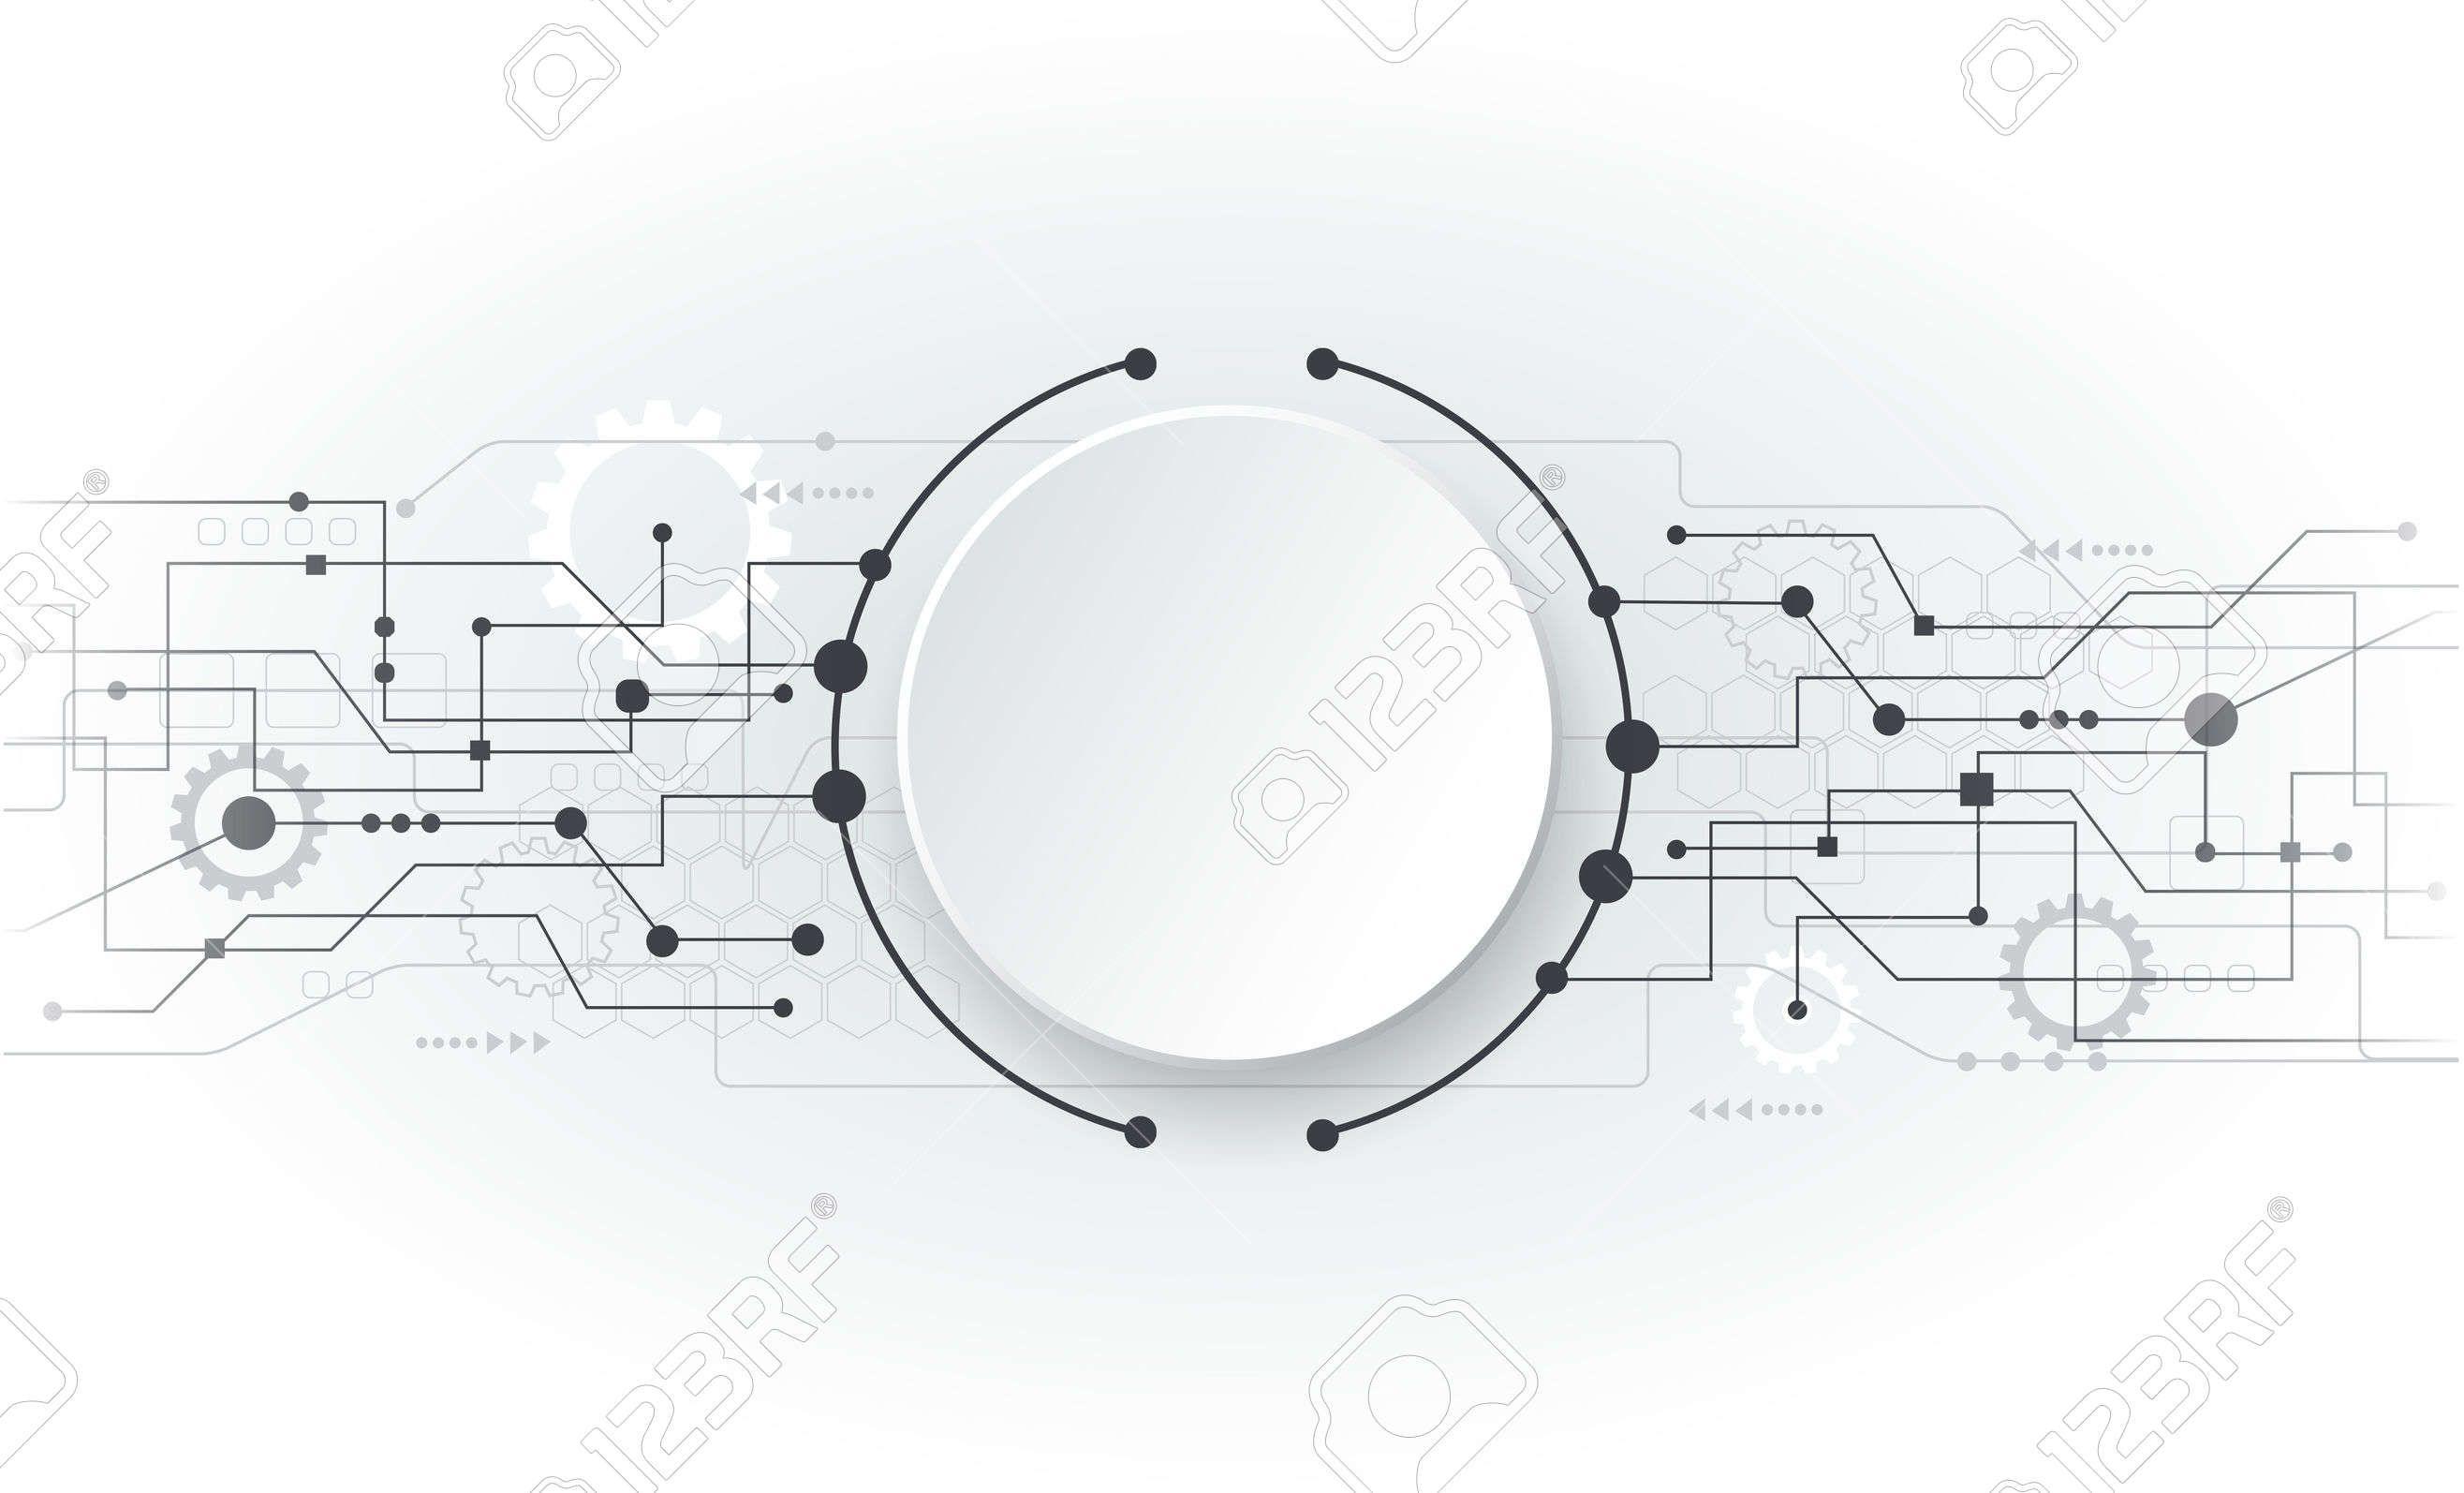 2631x1594 Vector Illustration Abstract Futuristic Circuit Board, Hi Tech